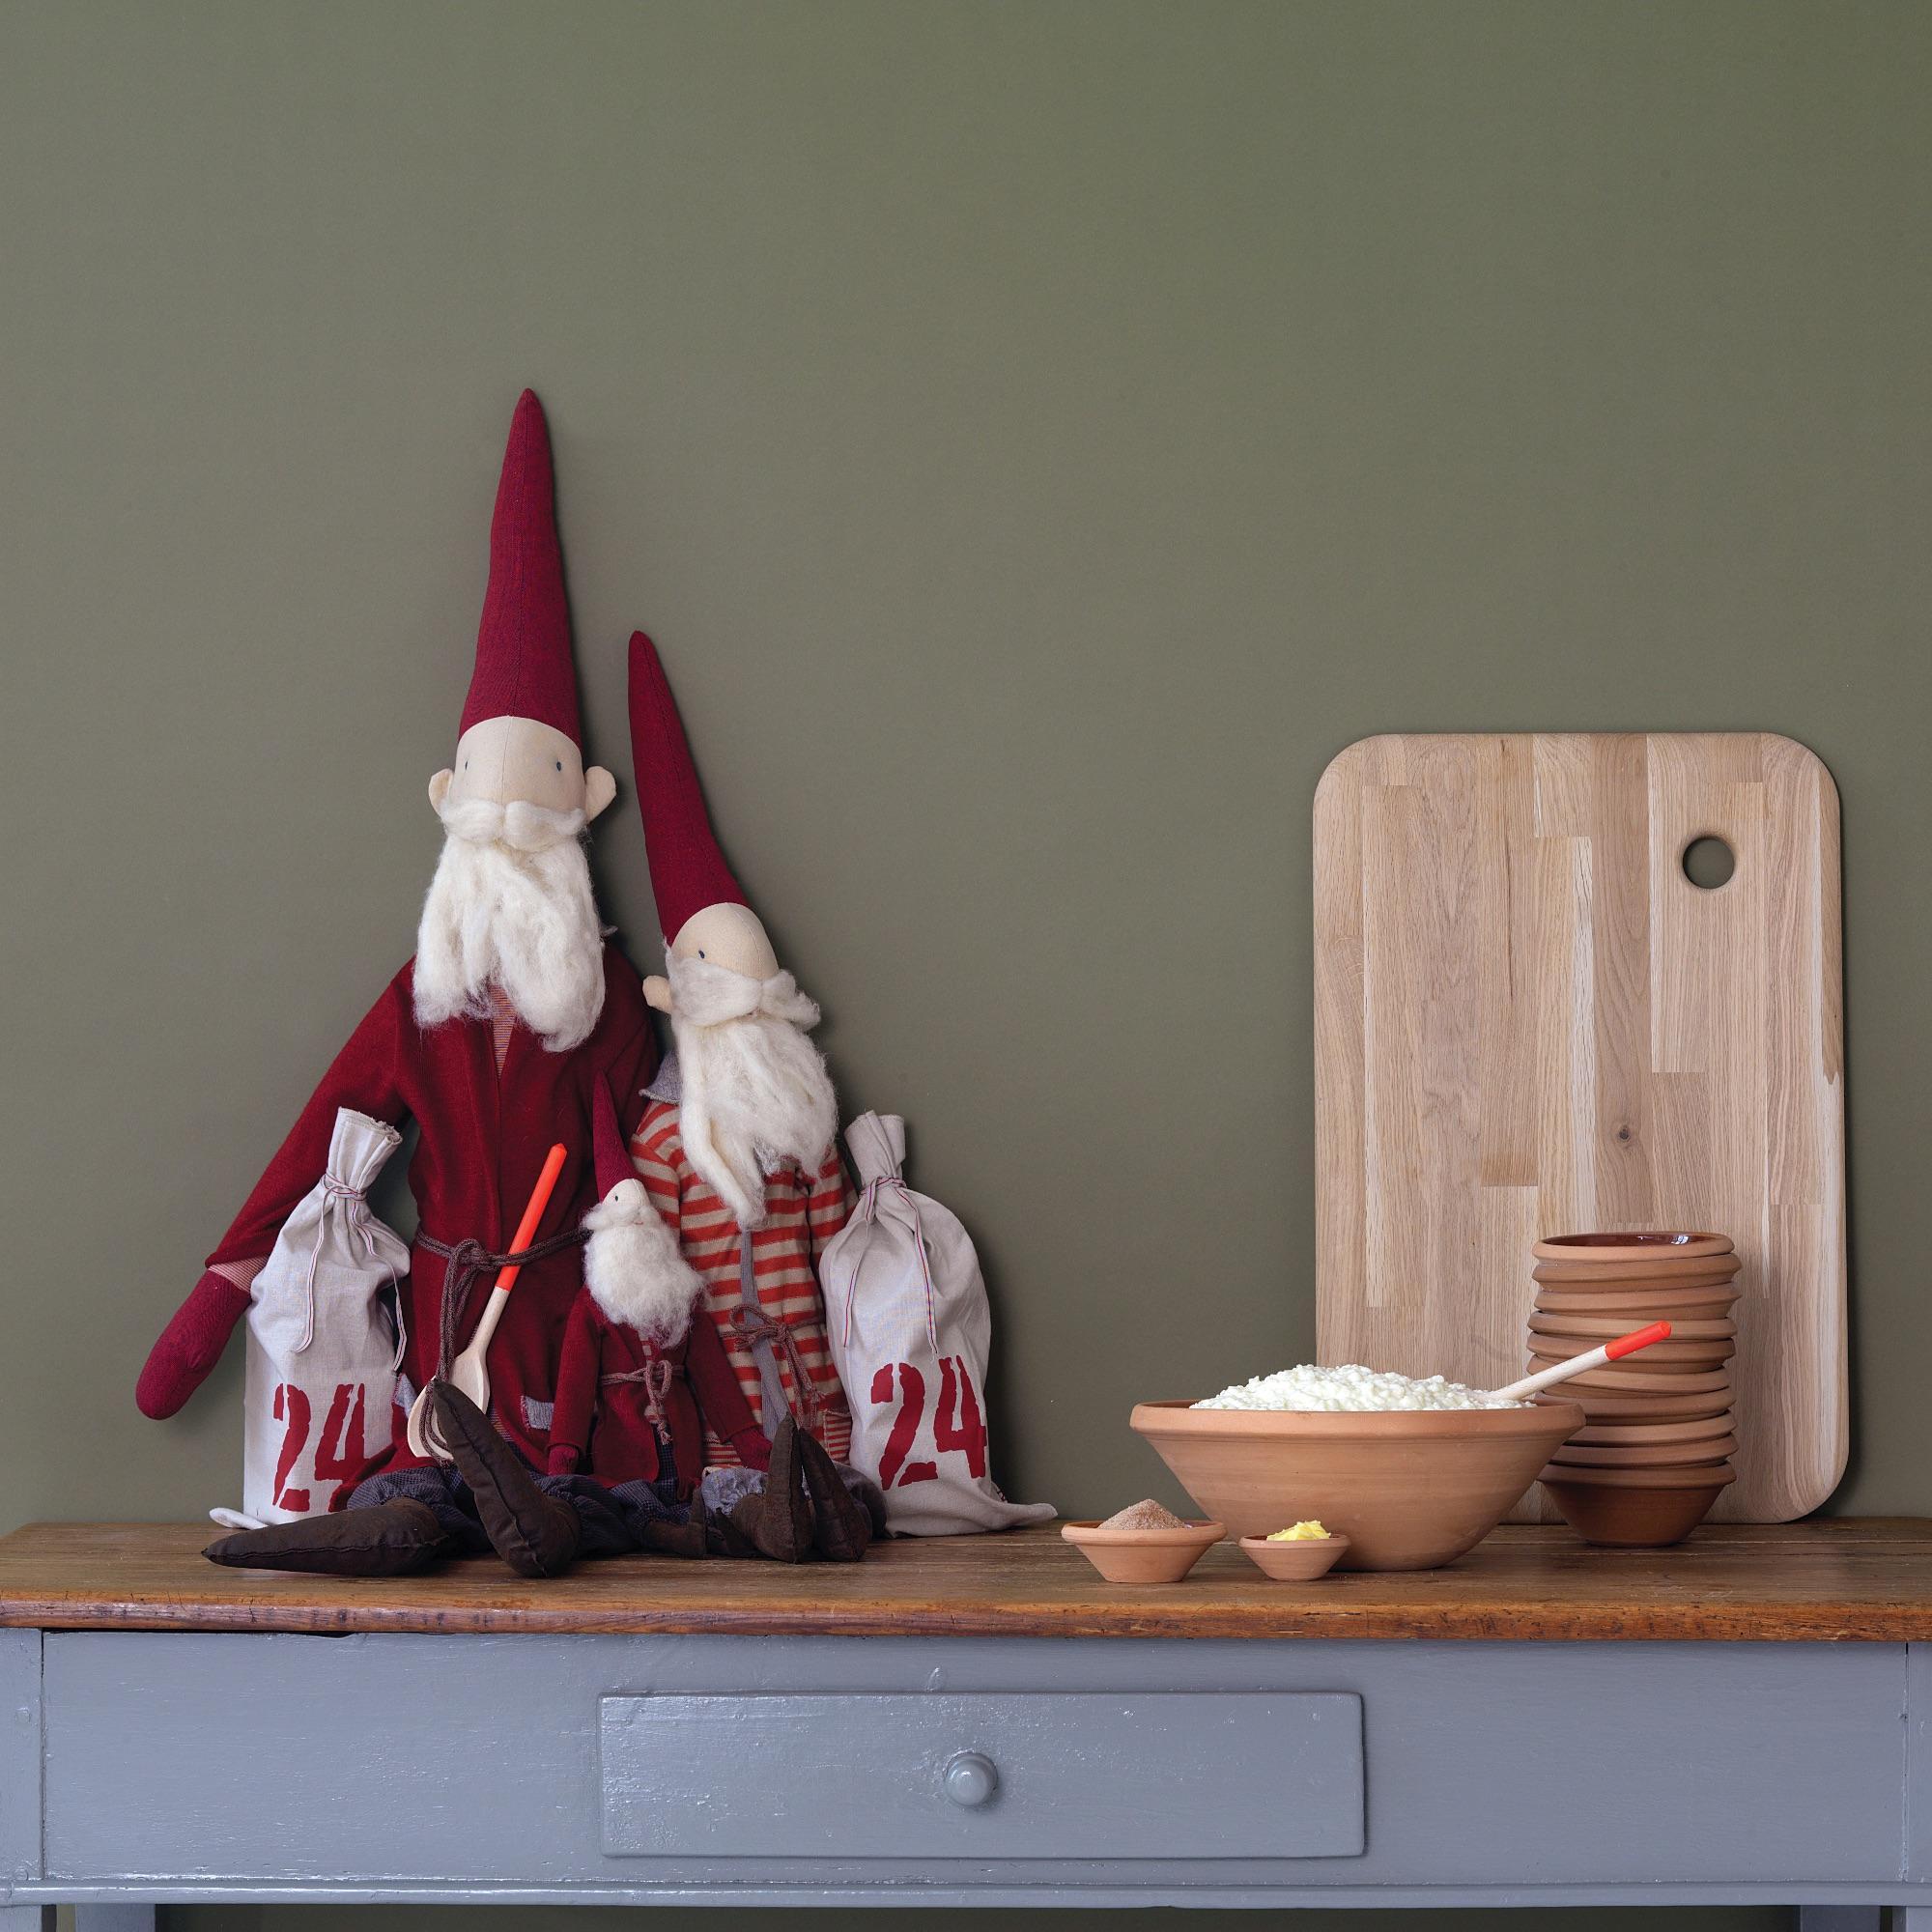 Maileg Knitted Santa Lifestyle